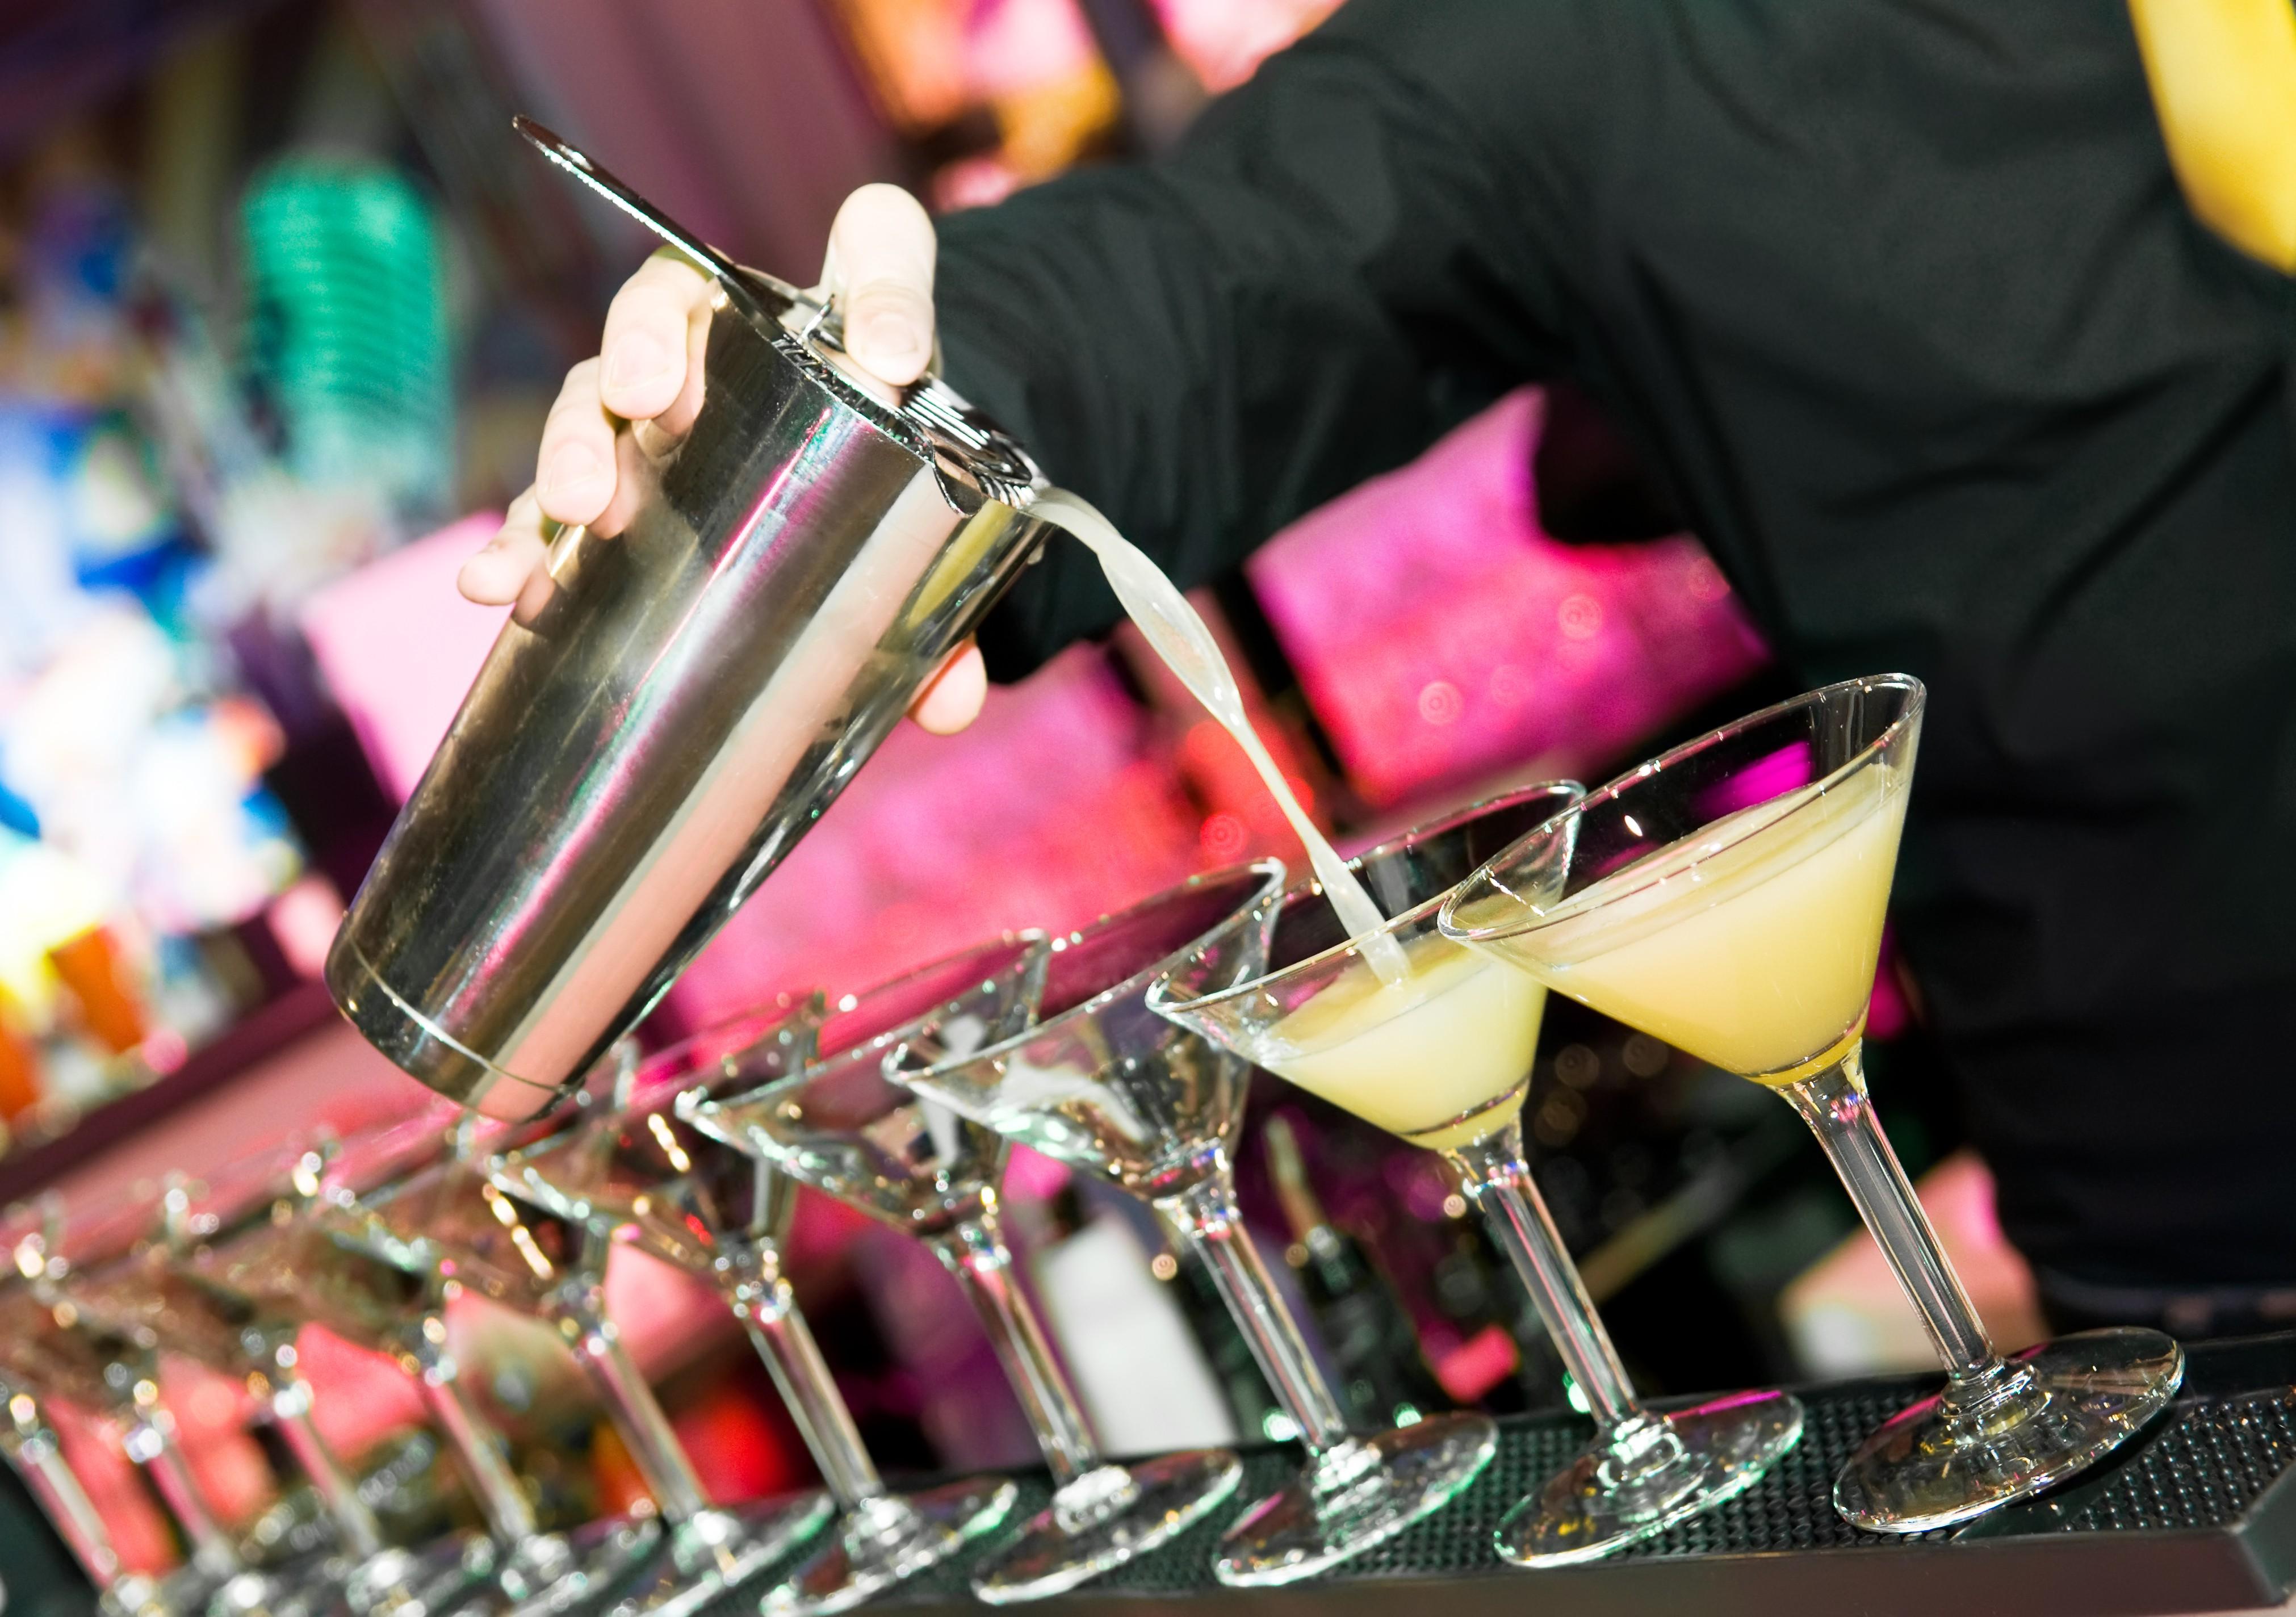 corsi barman roma